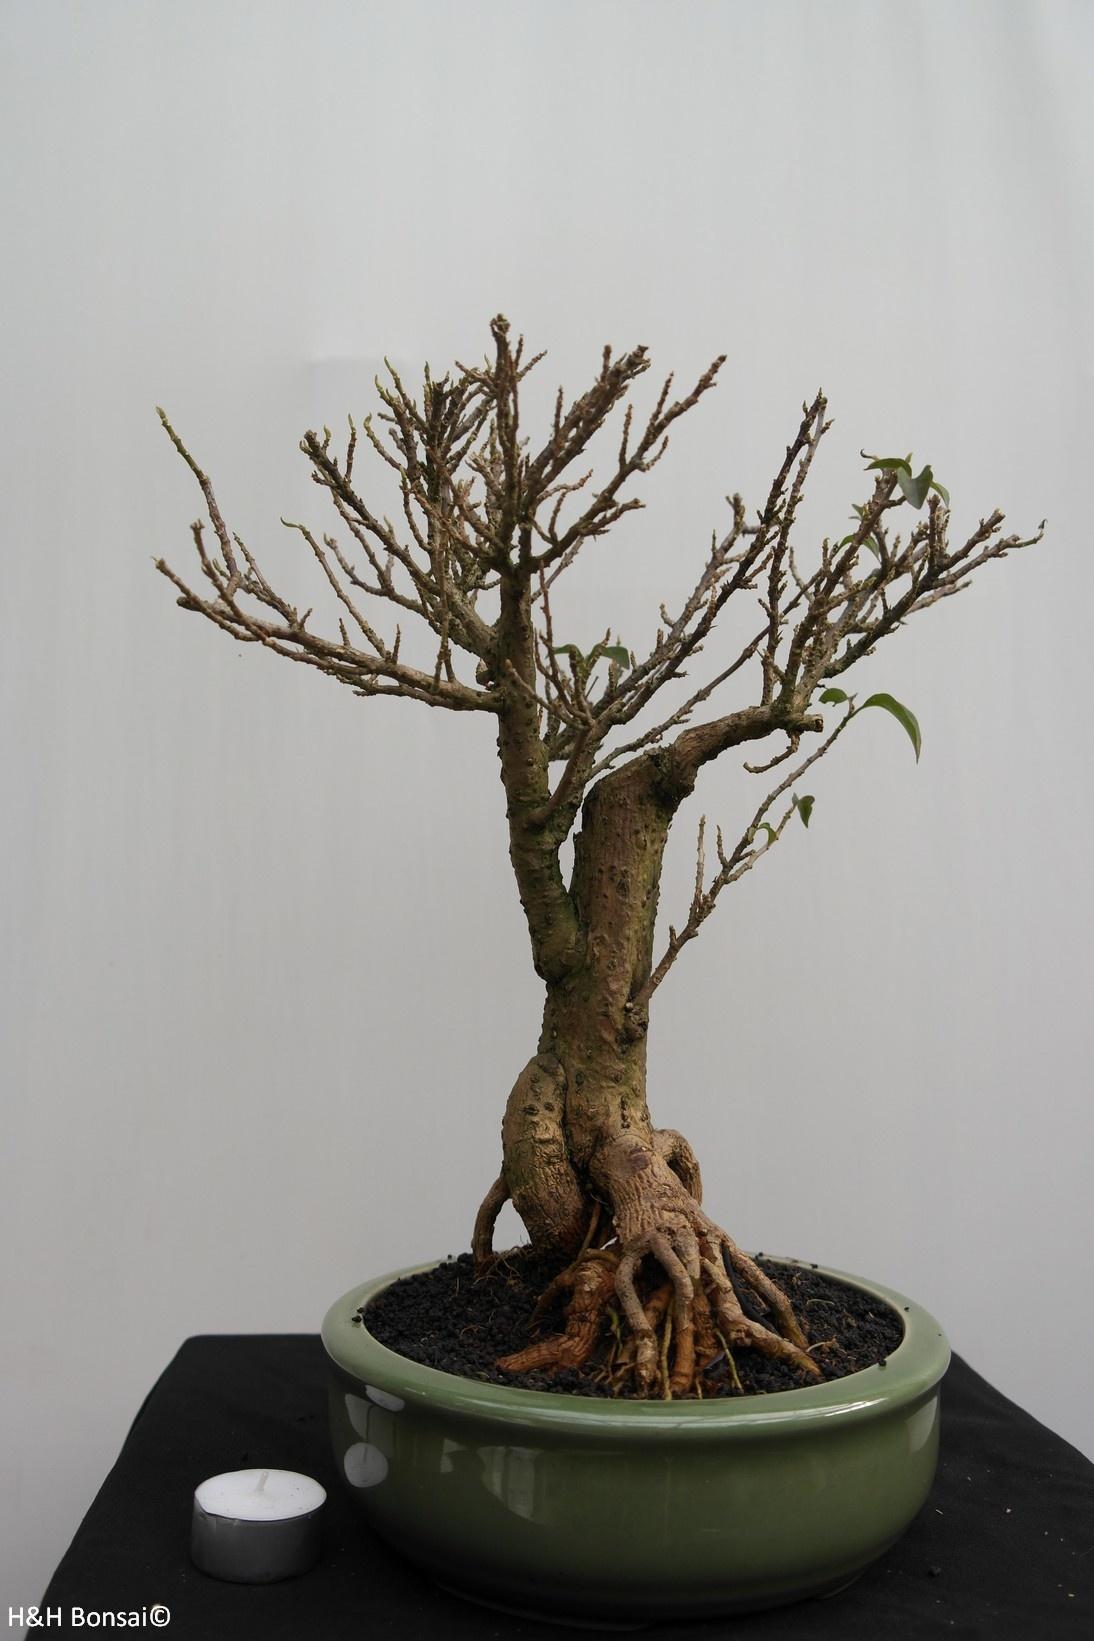 BonsaiBougainvillea glabra, nr. 7819